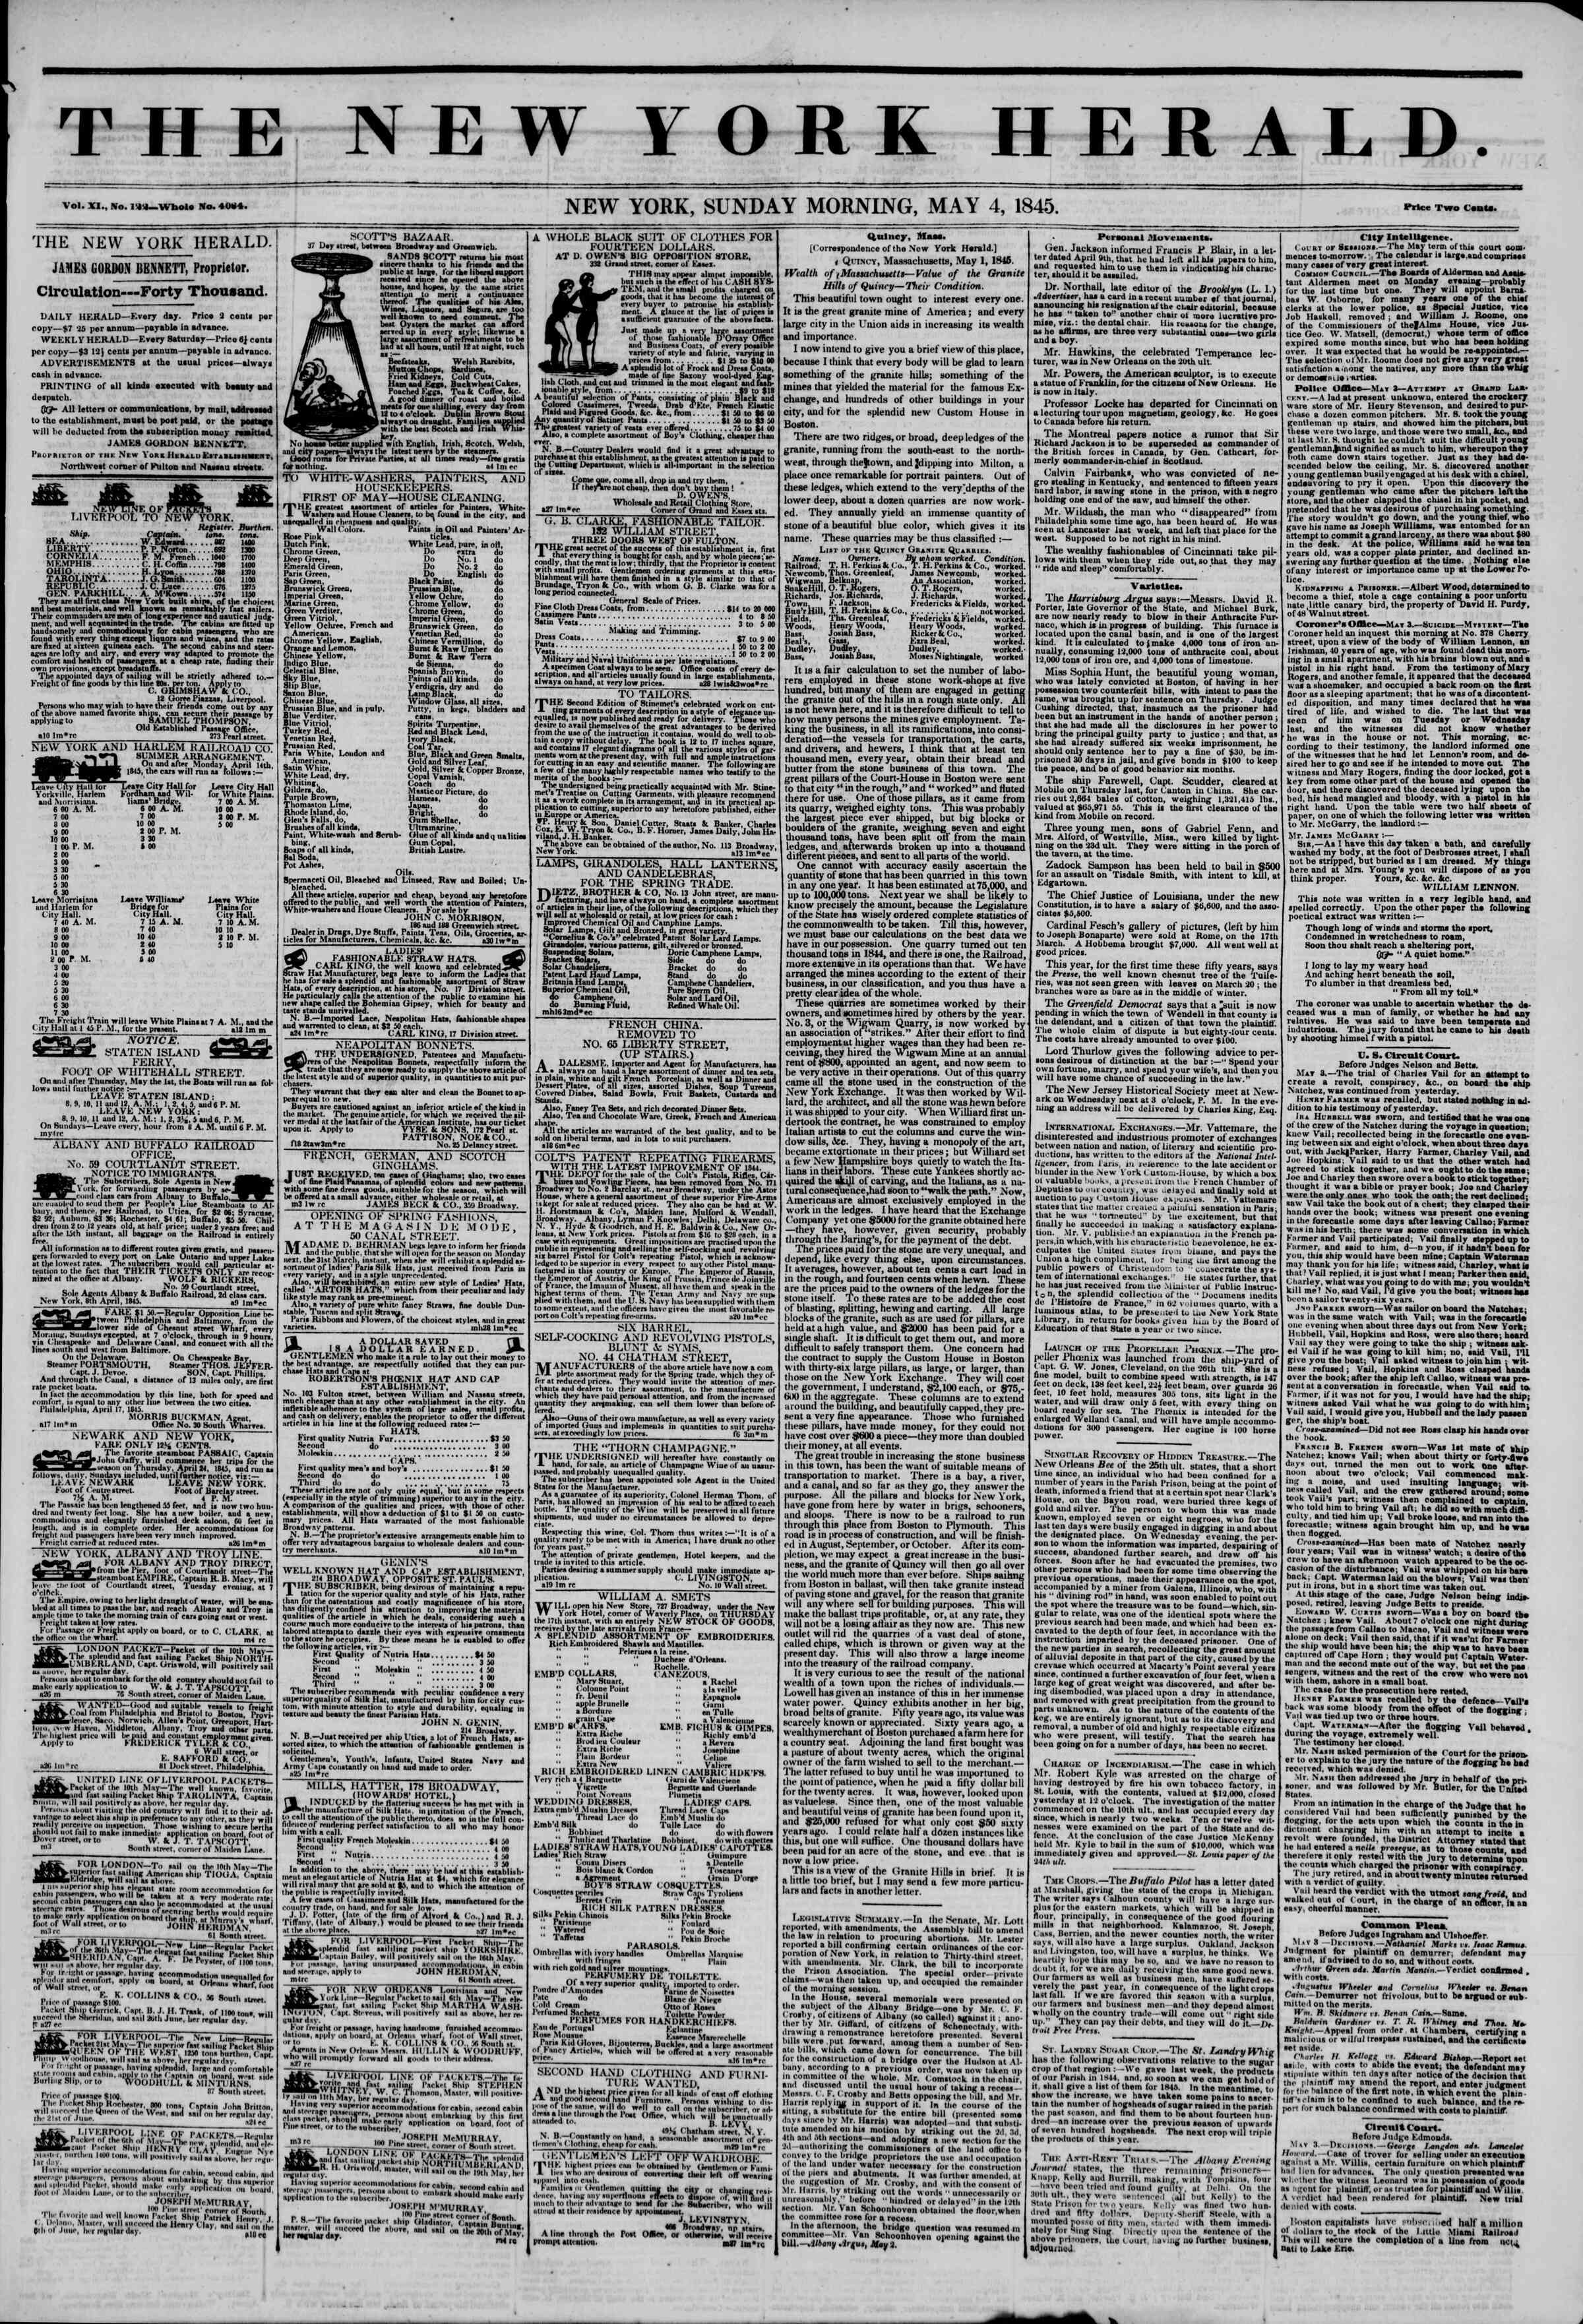 May 4, 1845 Tarihli The New York Herald Gazetesi Sayfa 1